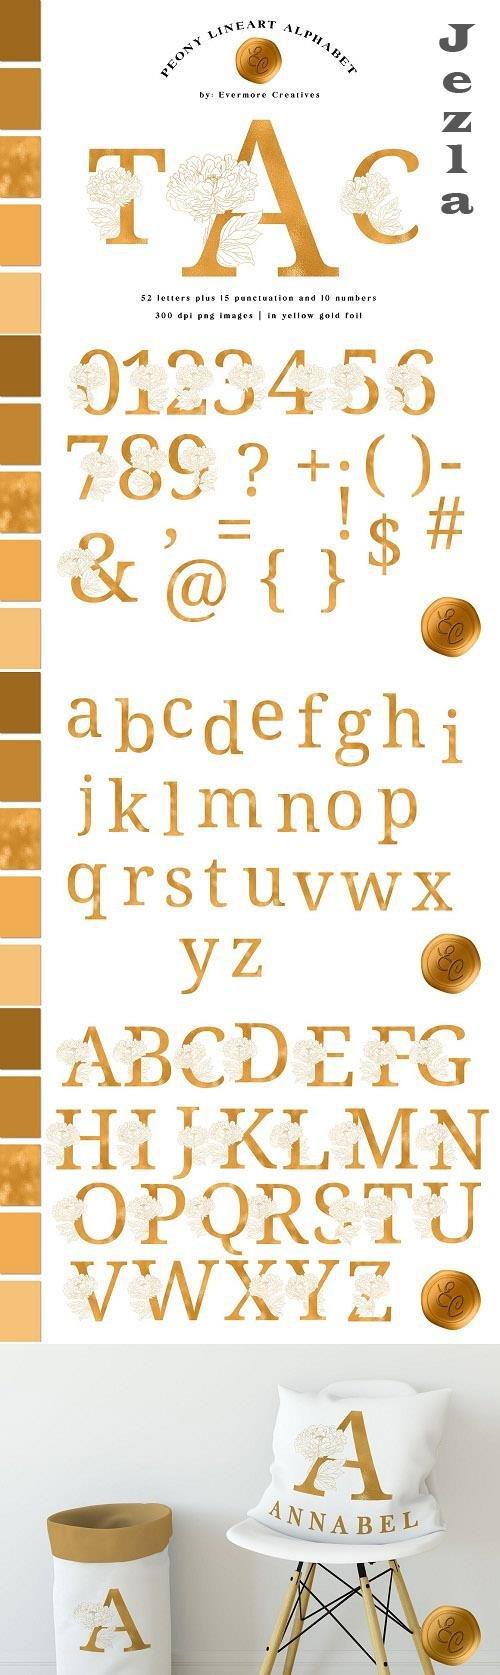 Line Art Peony Alphabet in Gold Foil - 6090219